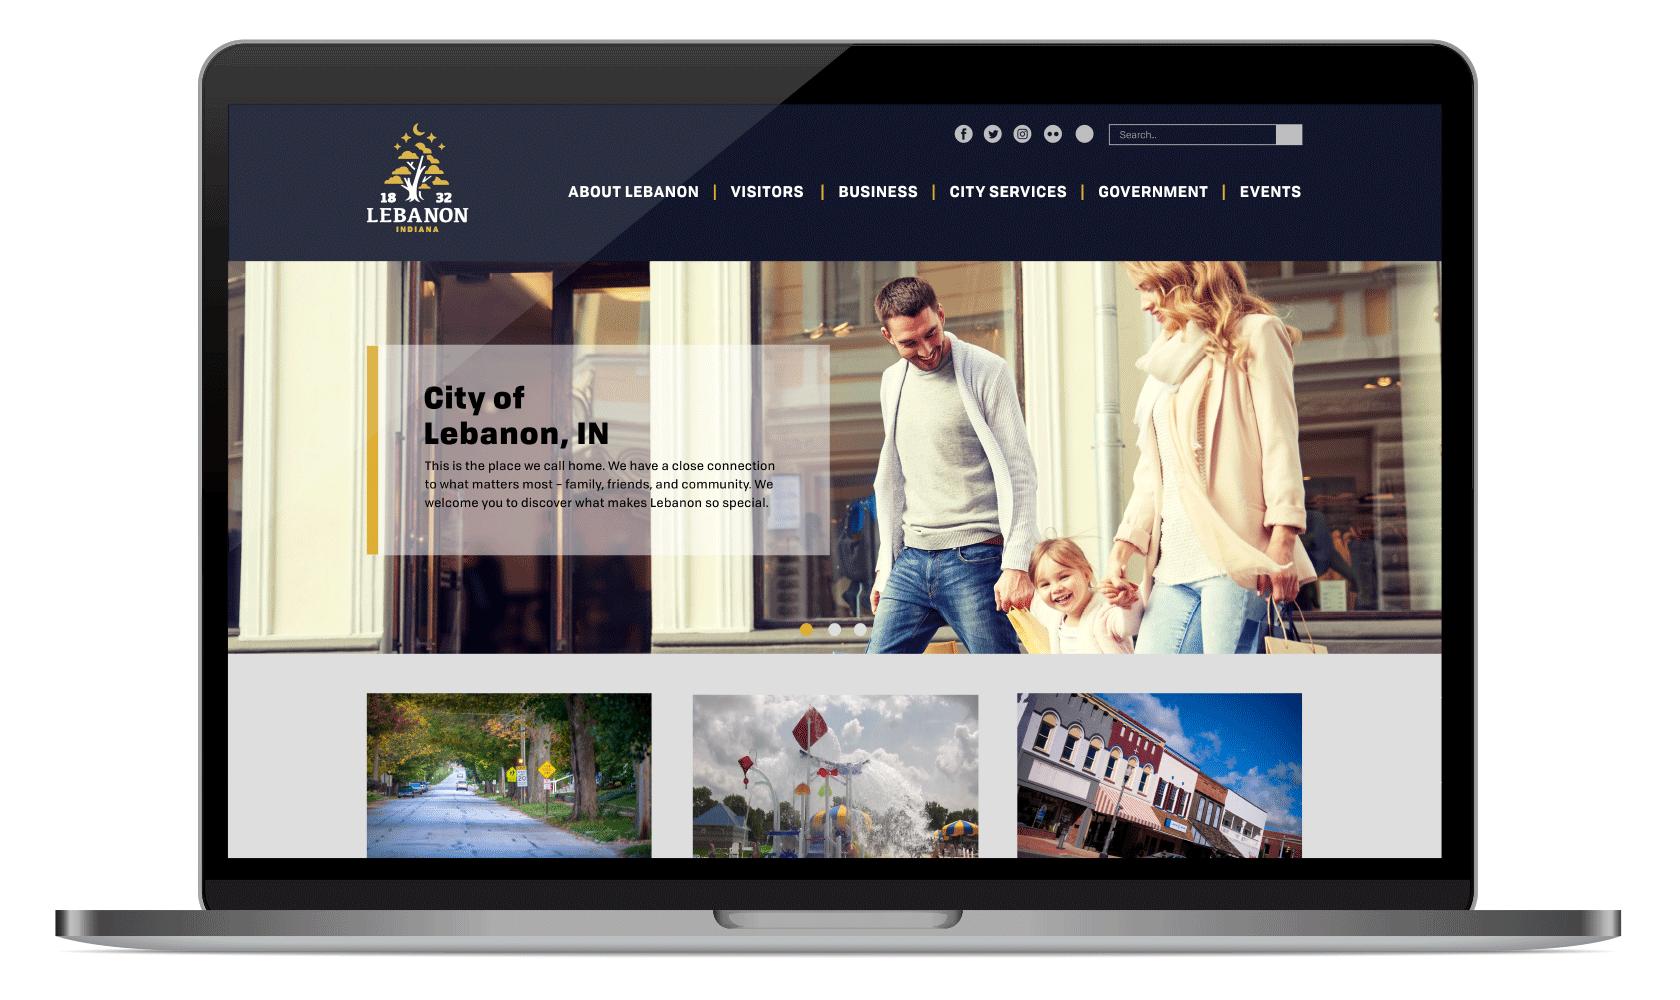 City of Lebanon Website Mockup